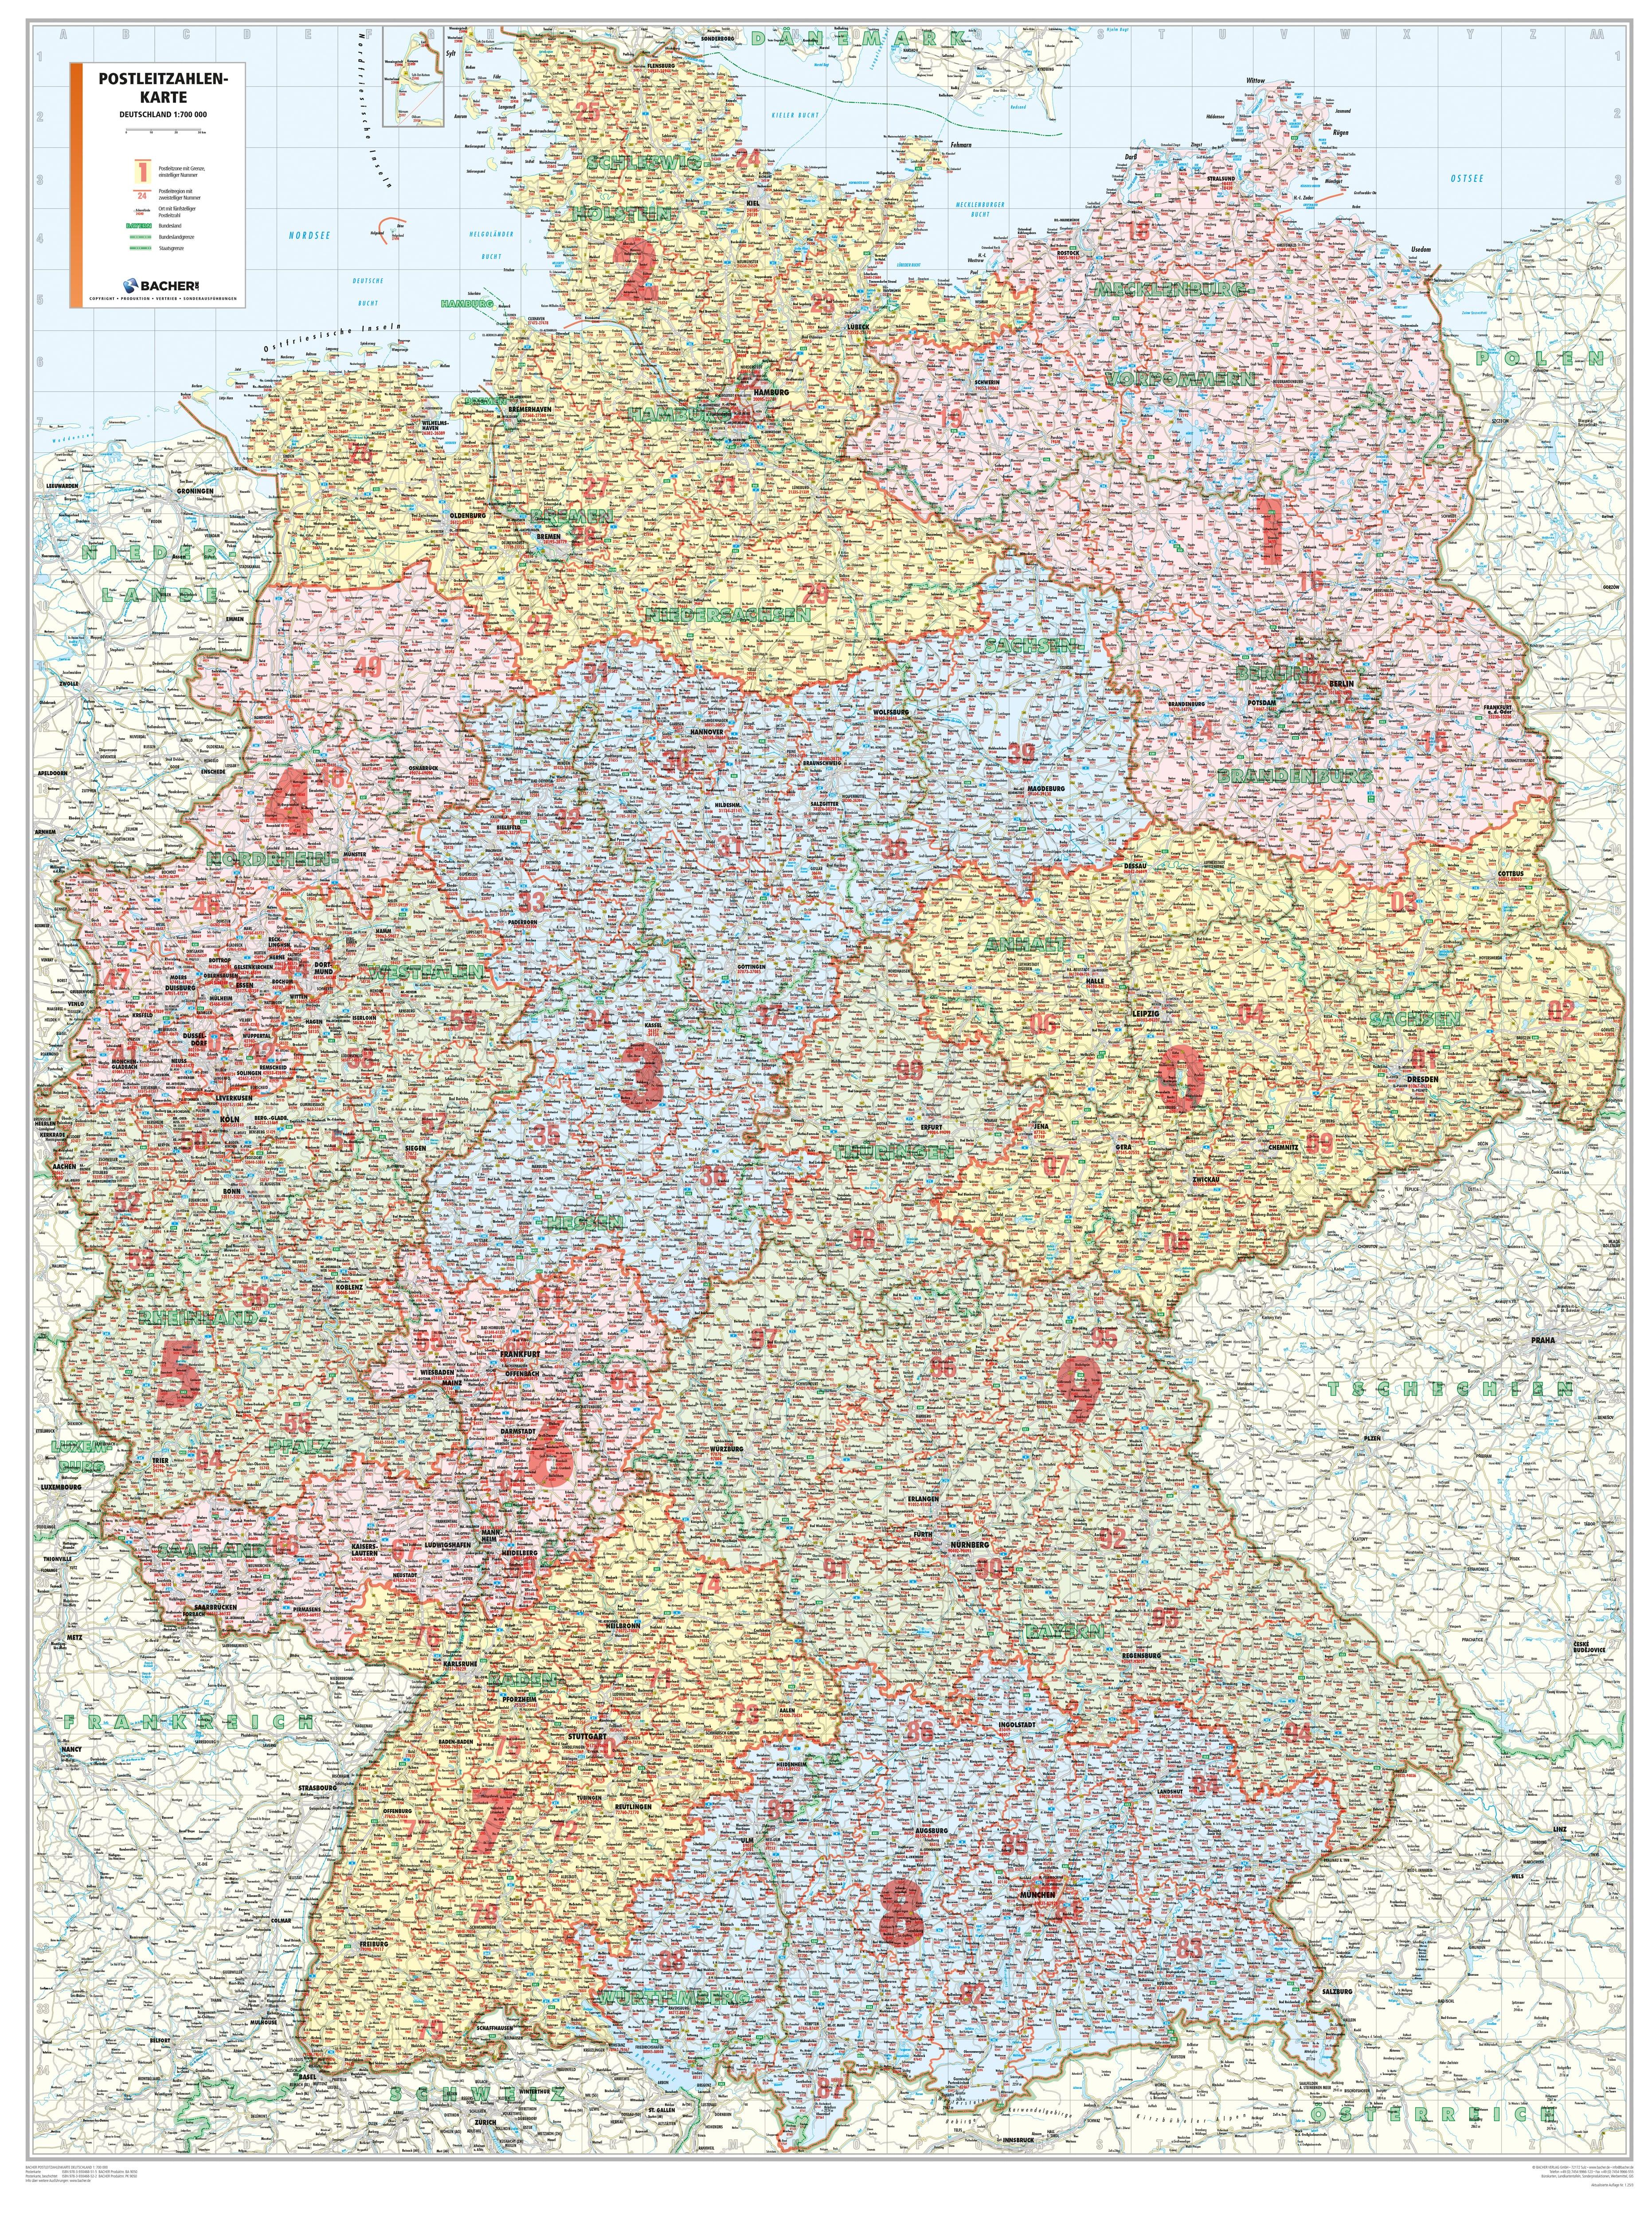 Postnumre I Tyskland Plz 98 X 129cm Postnummer Kort Tyskland